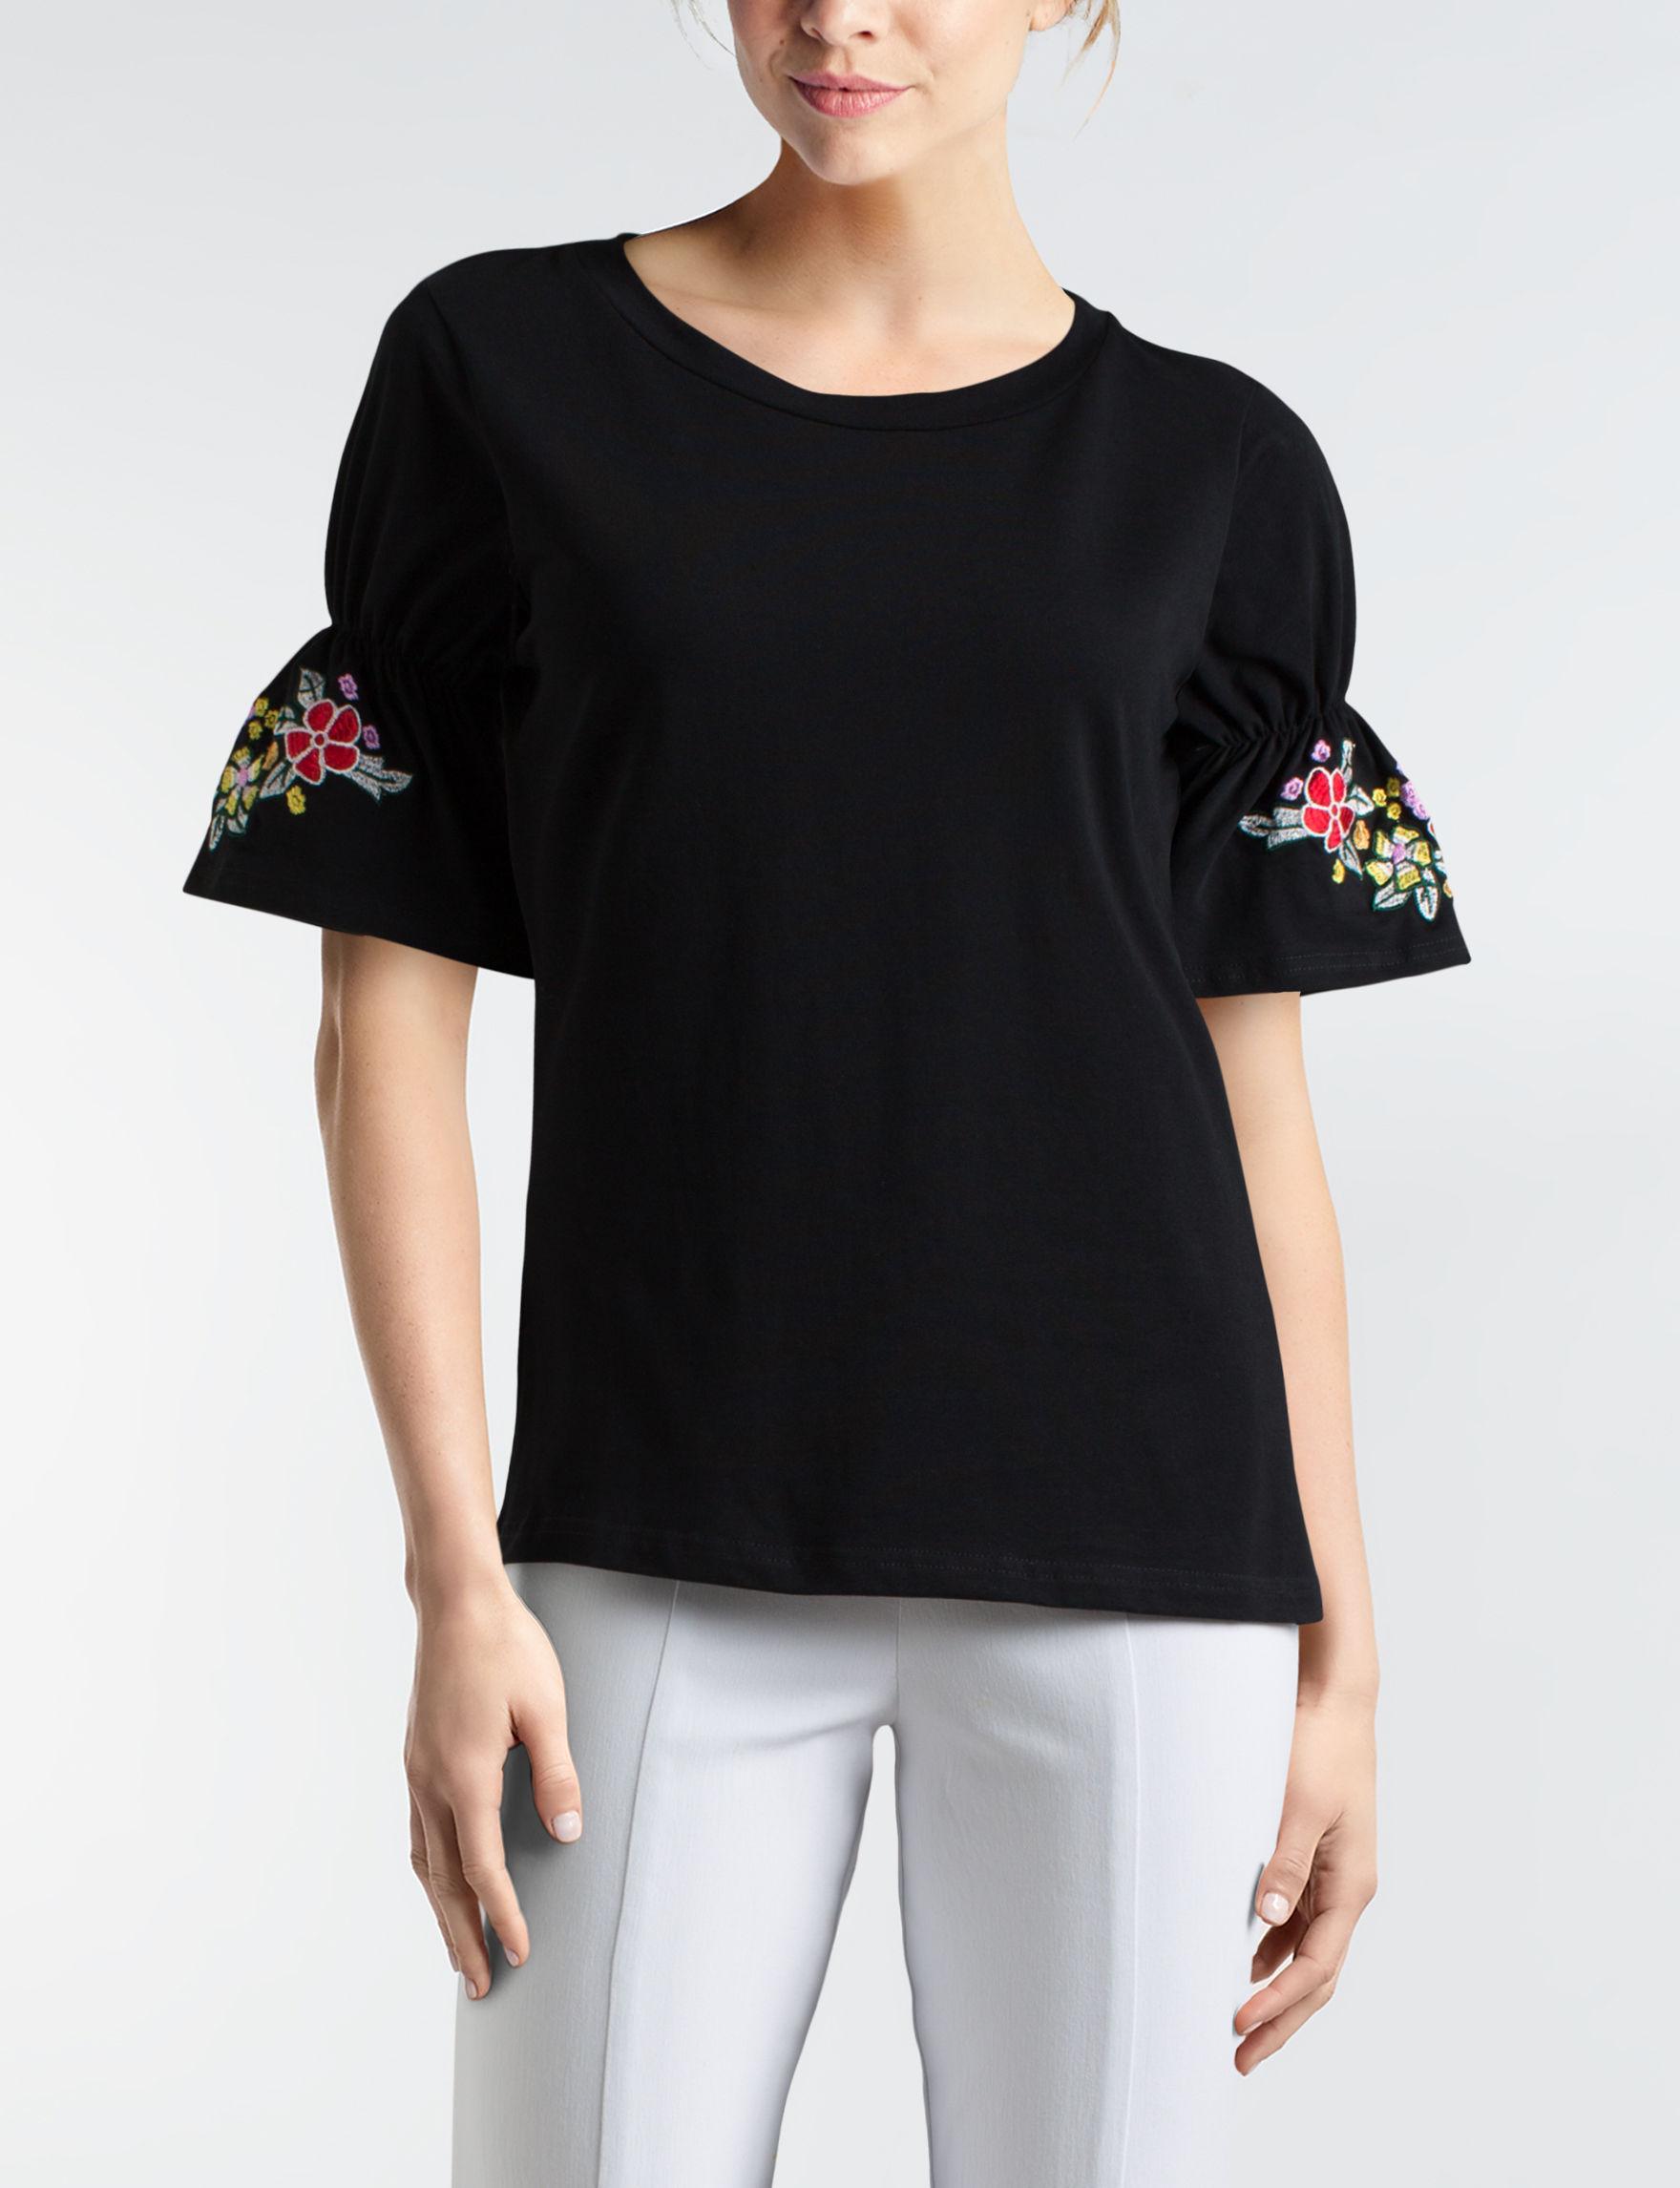 August Silk Black Shirts & Blouses